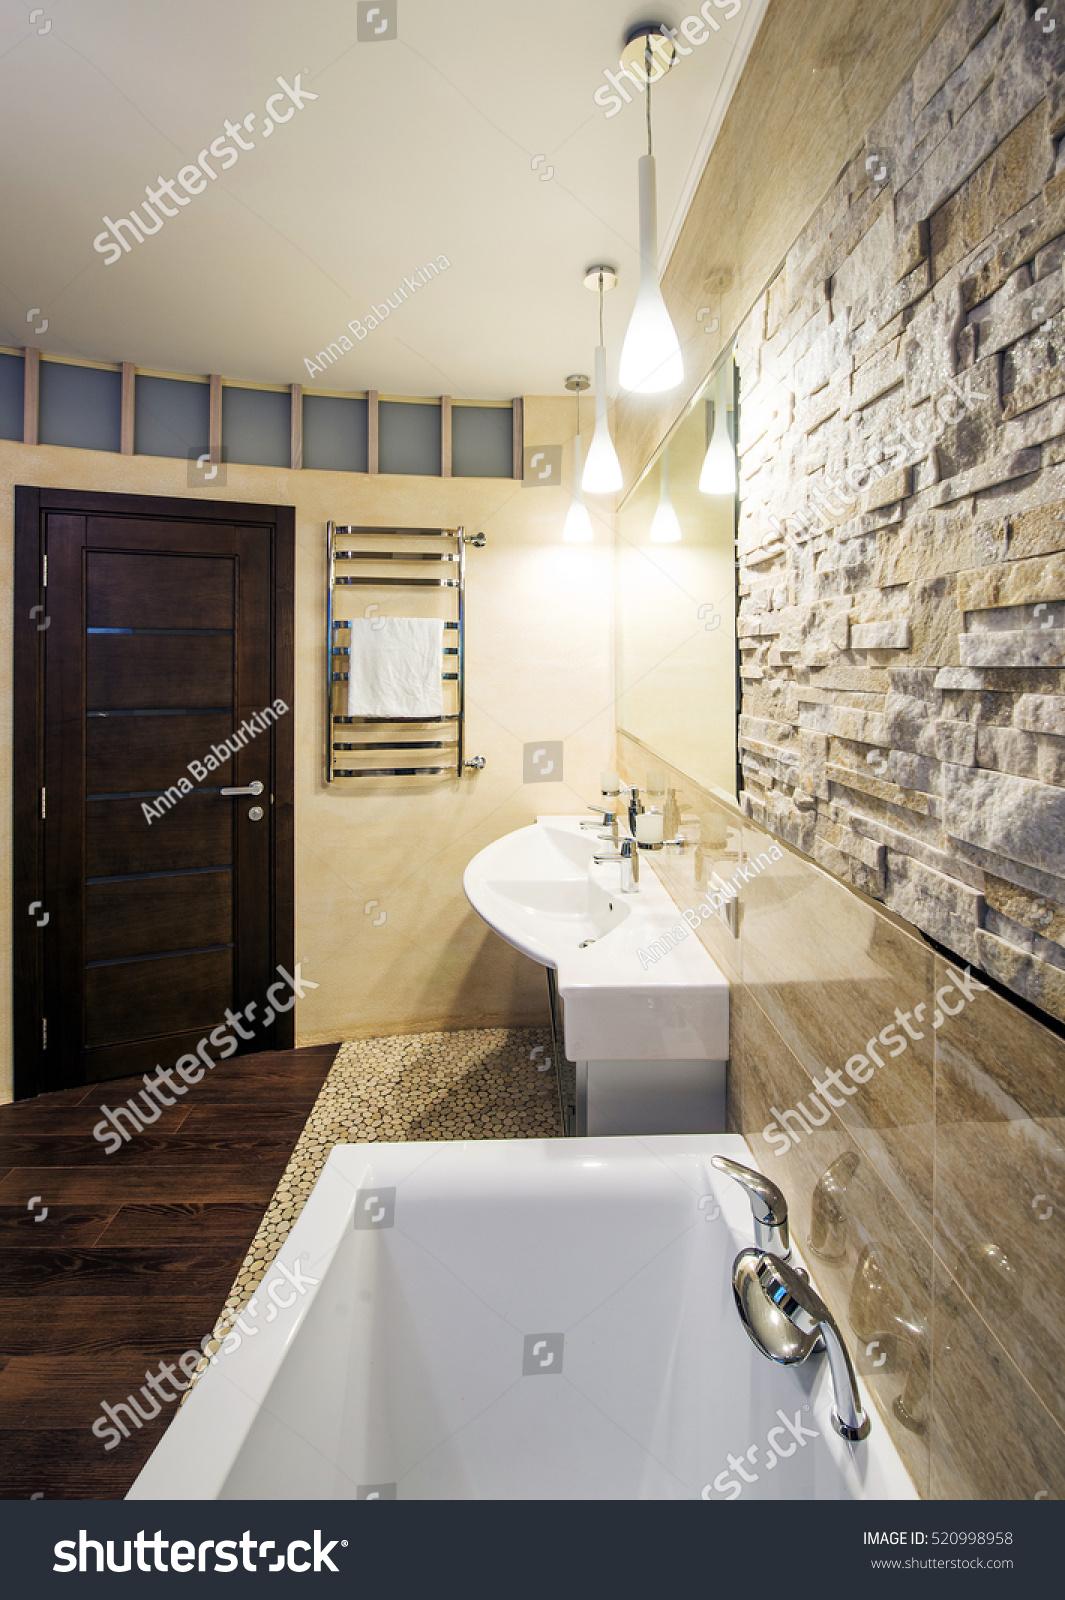 Modern Spacious Bathroom Suite Designed Luxury Stock Photo 520998958 Shutterstock